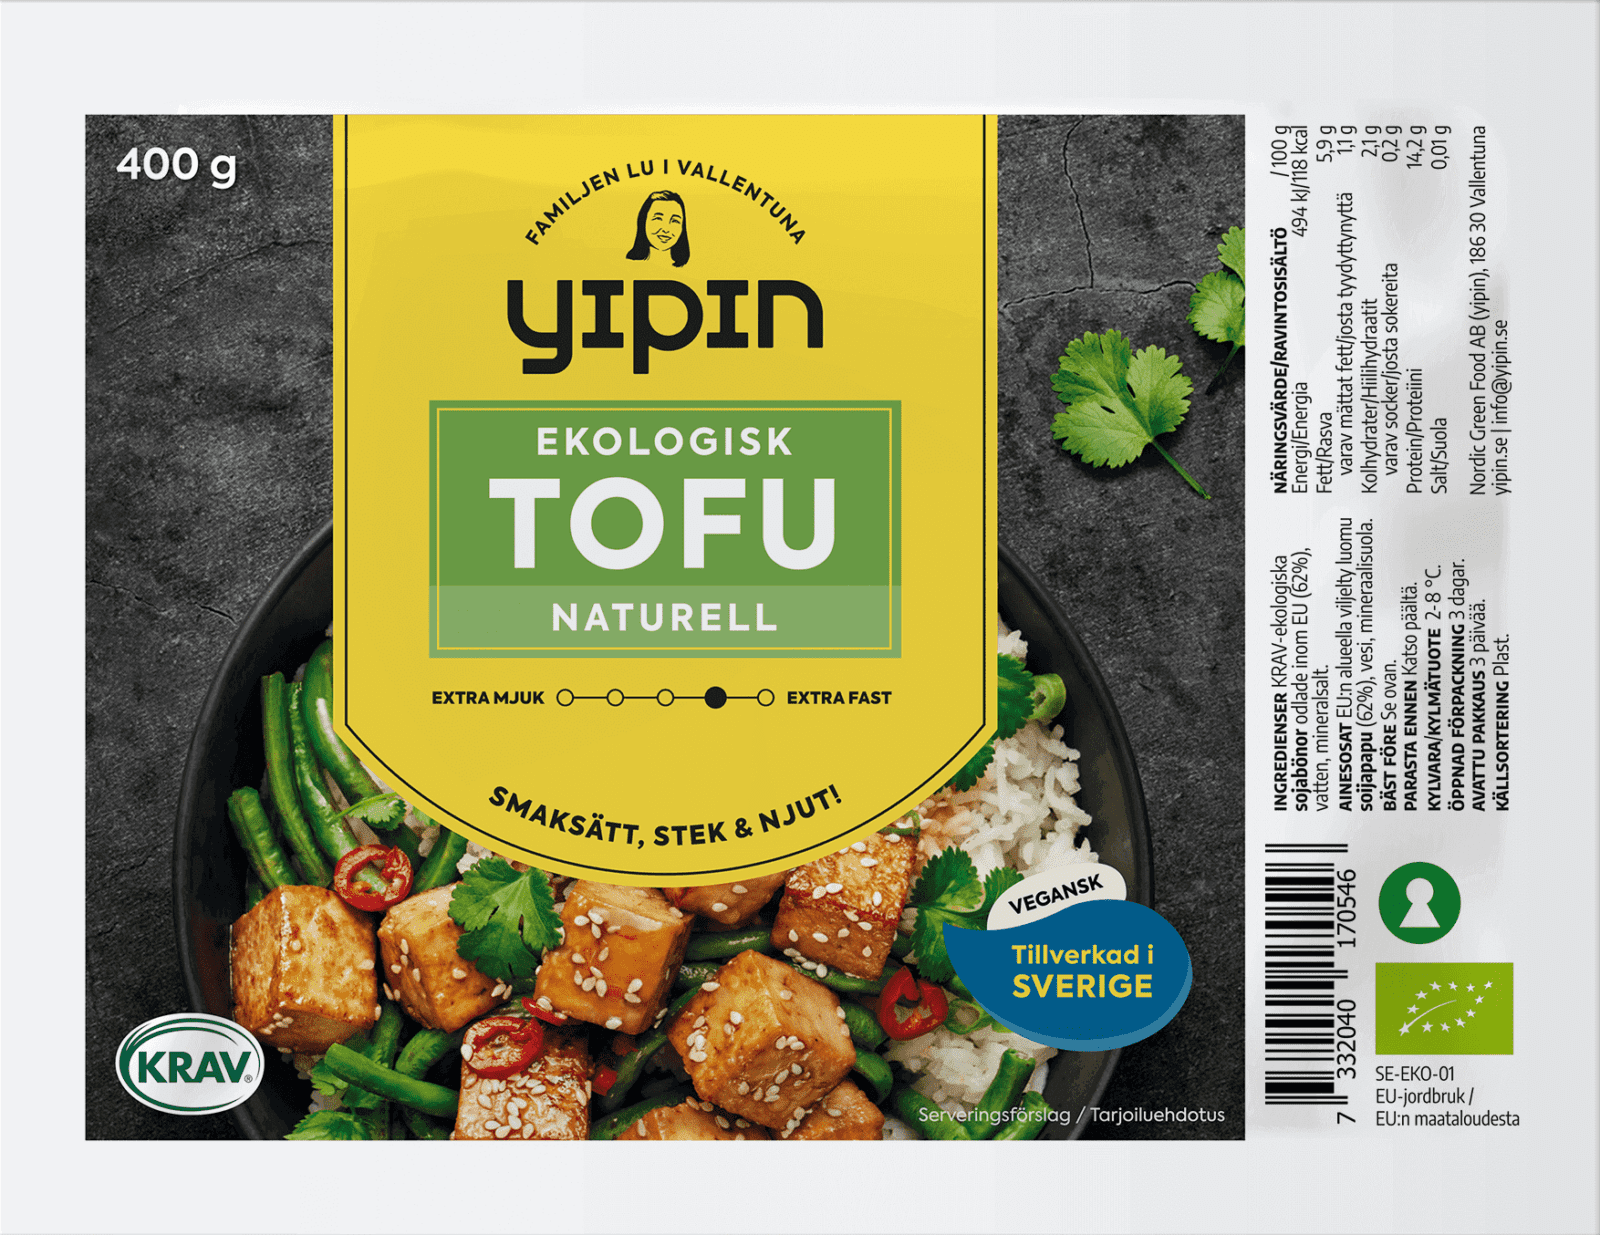 Bilden visar Yipin fast tofu naturell (400 g), ekologisk